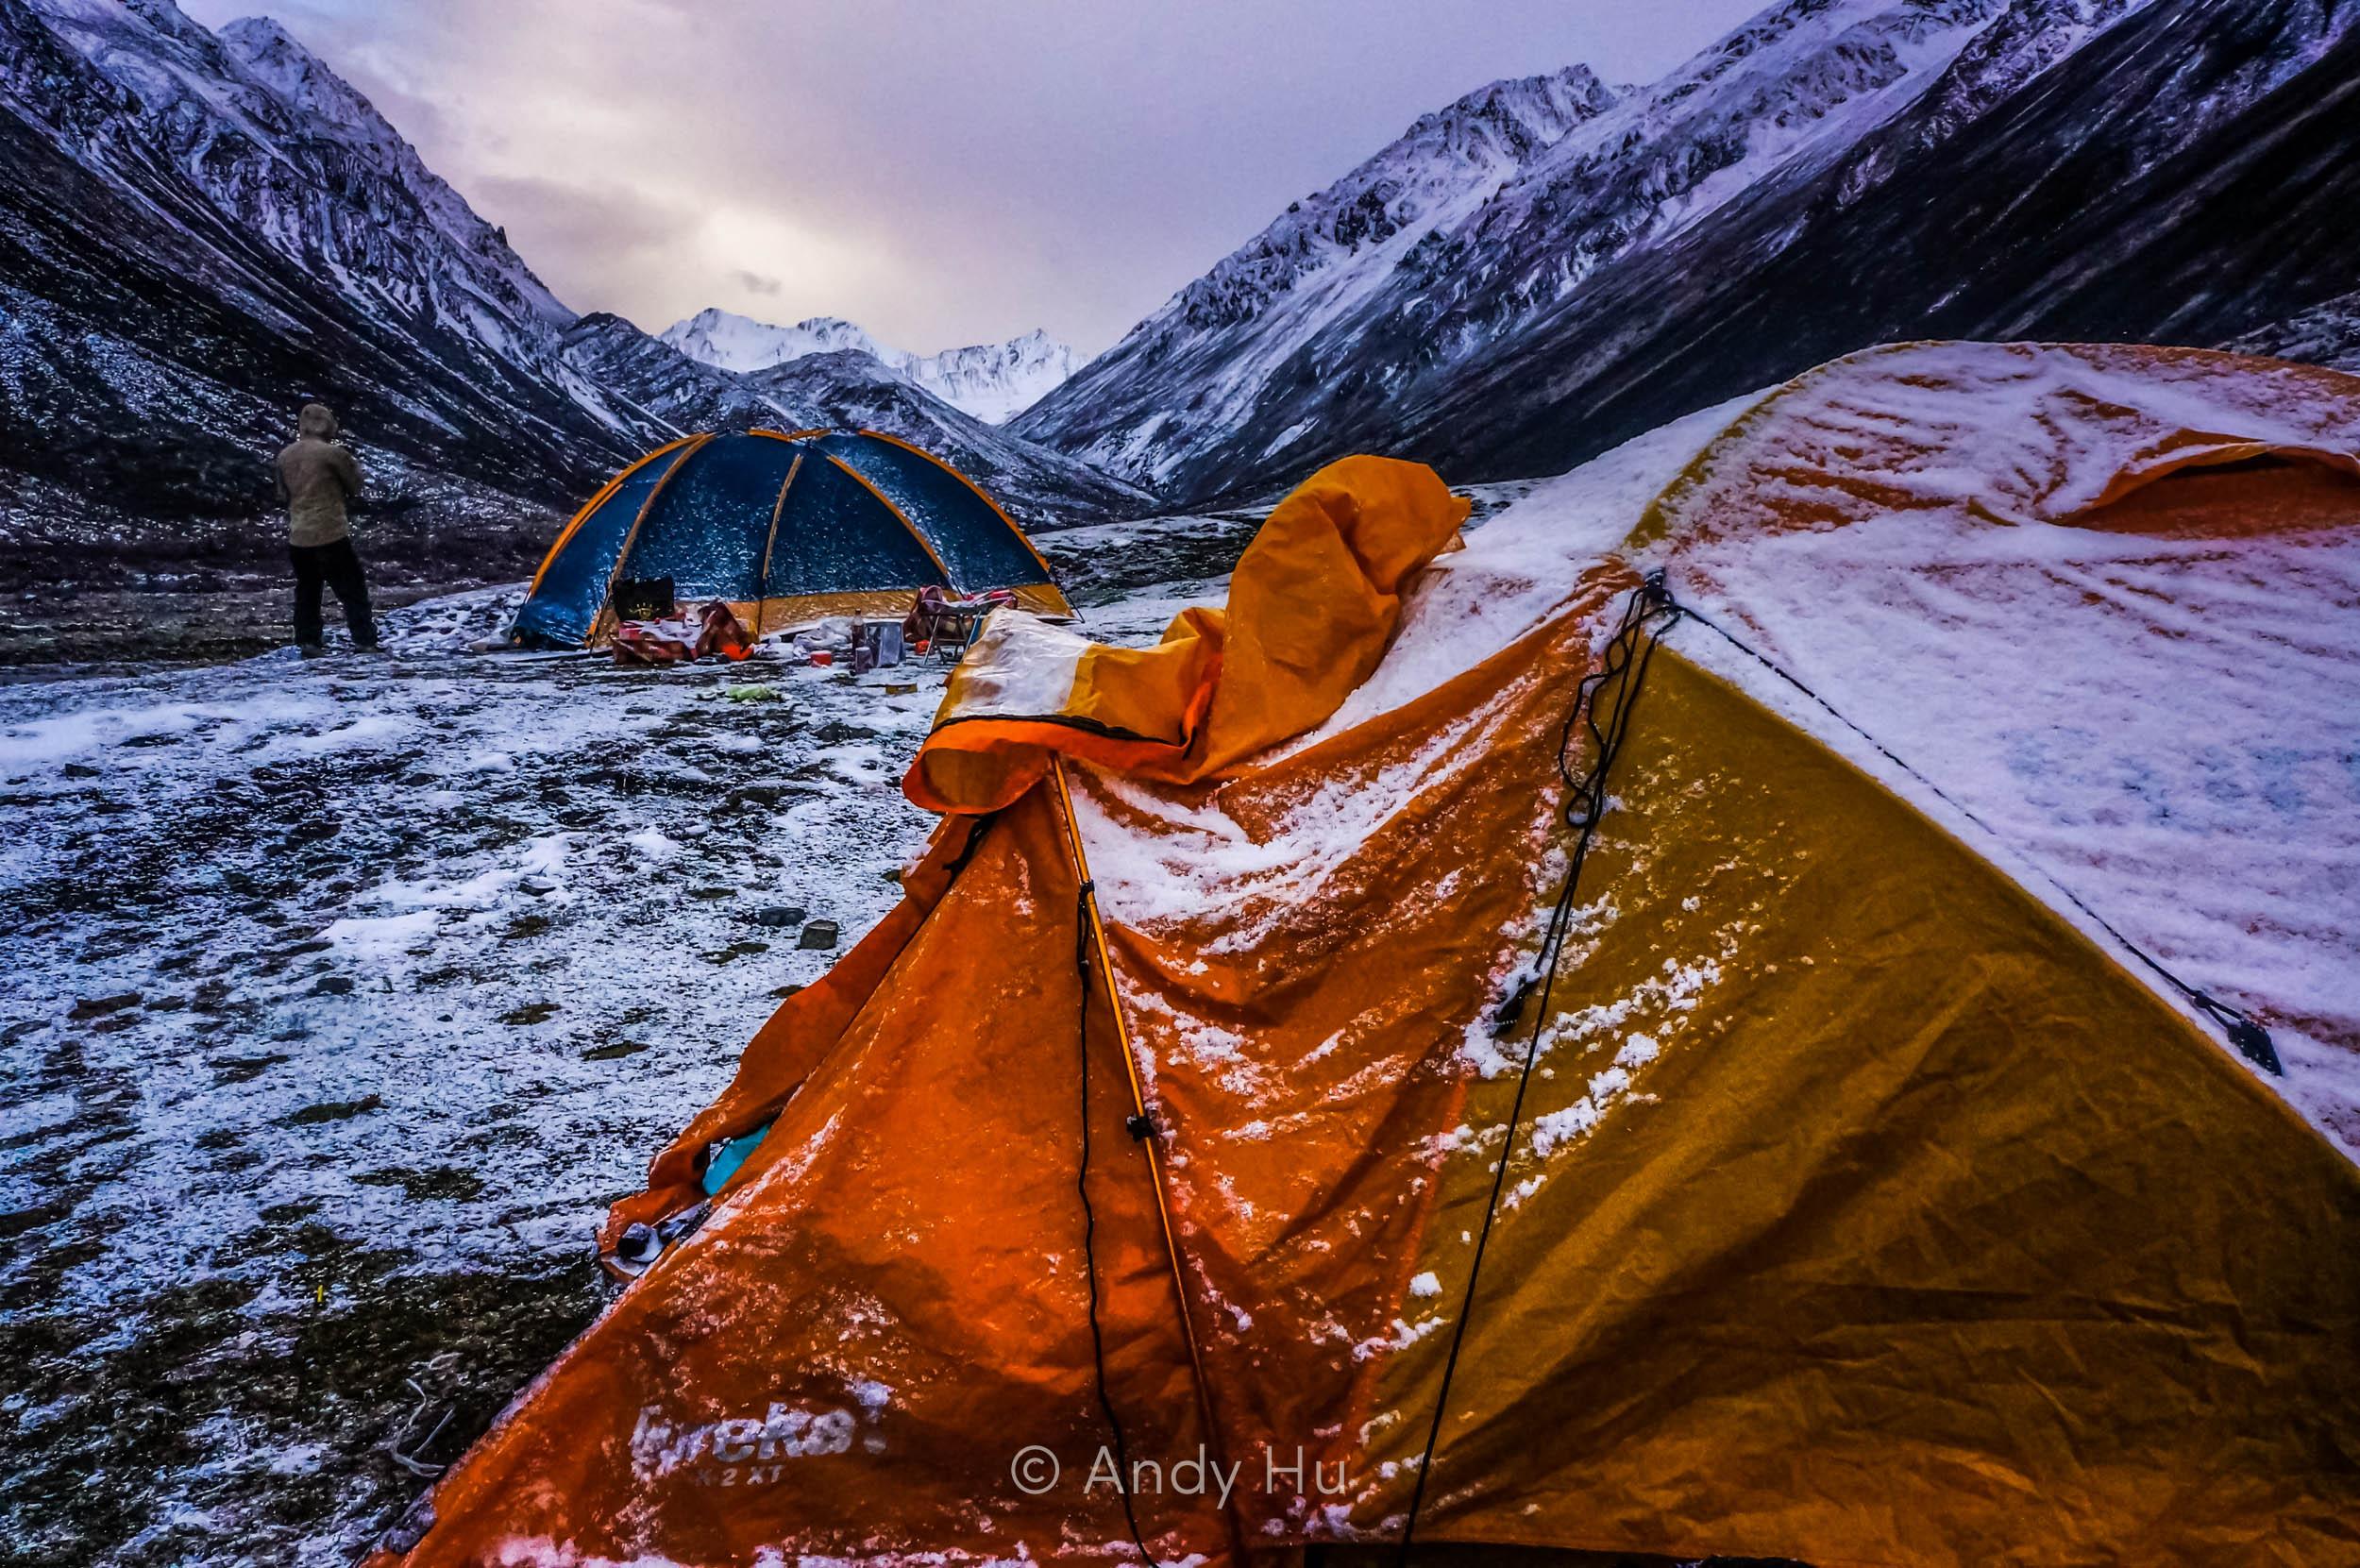 Dusk at campsite in Lower Riwoche, day 1 Mt. Gongga Trek